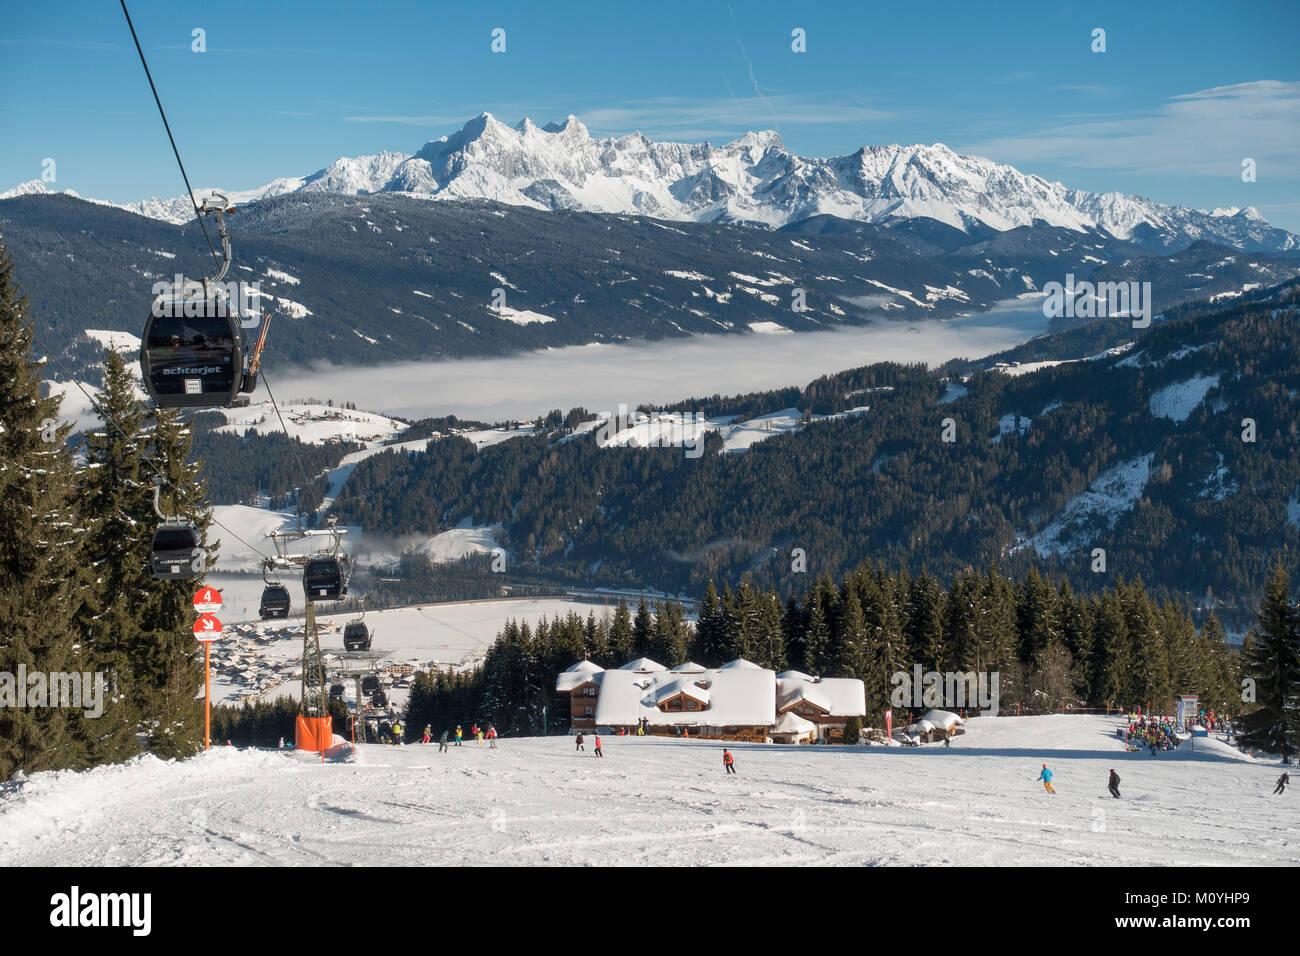 Ski Slope With Lift At The Griesenkareck1991mregion Amadebehind Dachstein Massifcommunity Flachau